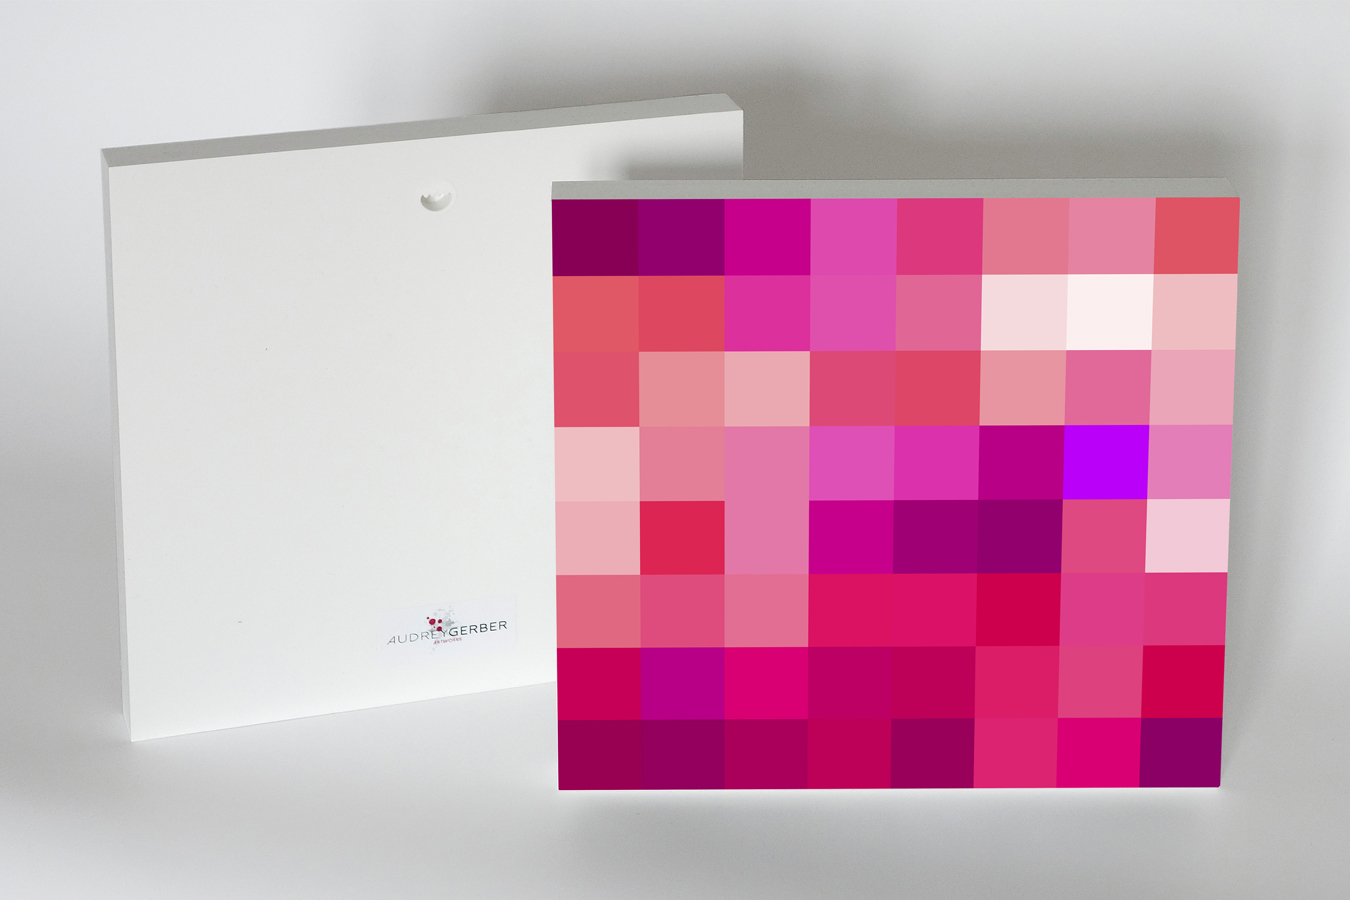 Forex smart x 19 mm